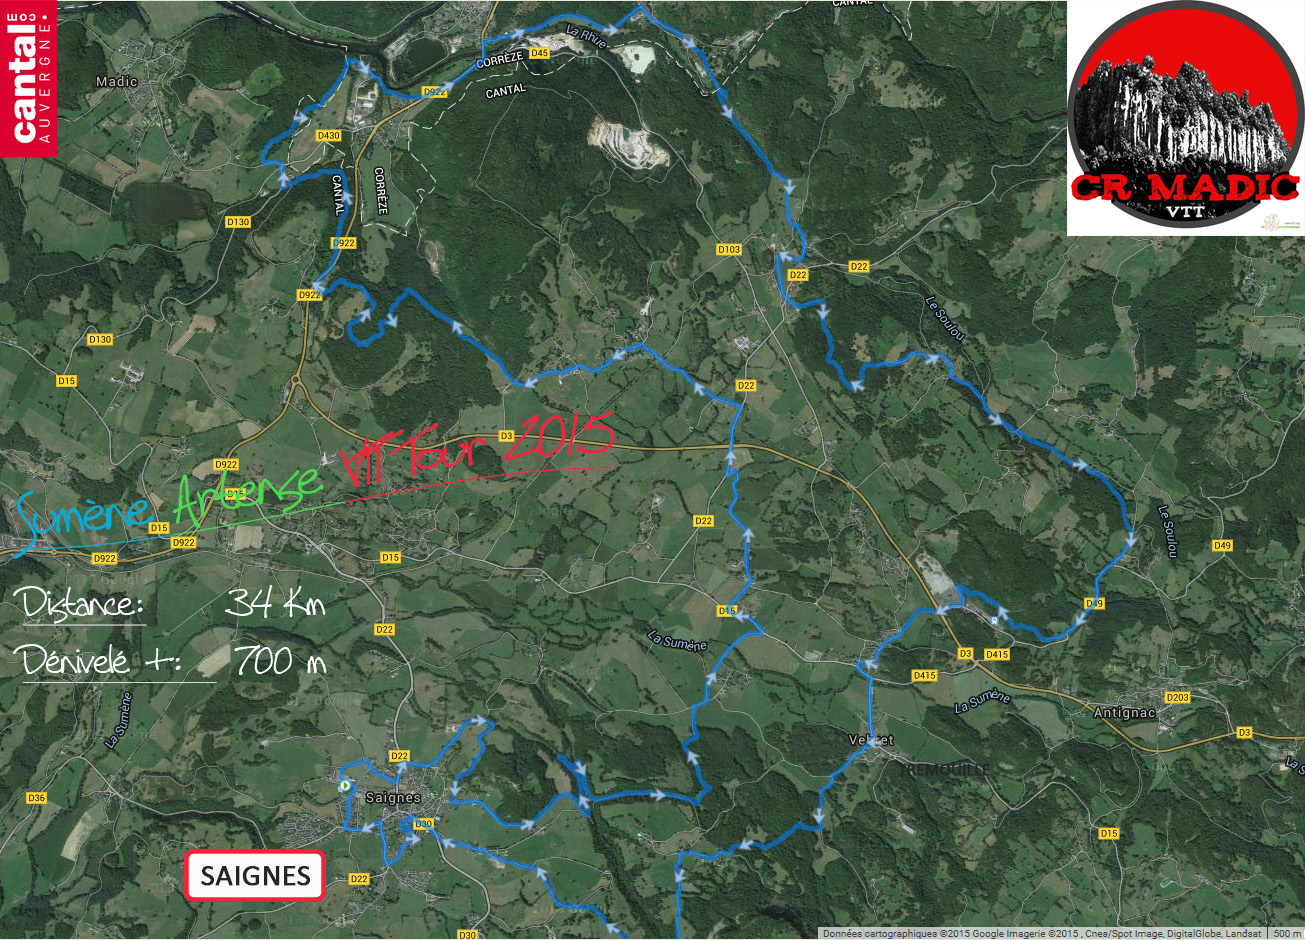 2015 savtt tour 34 km distance